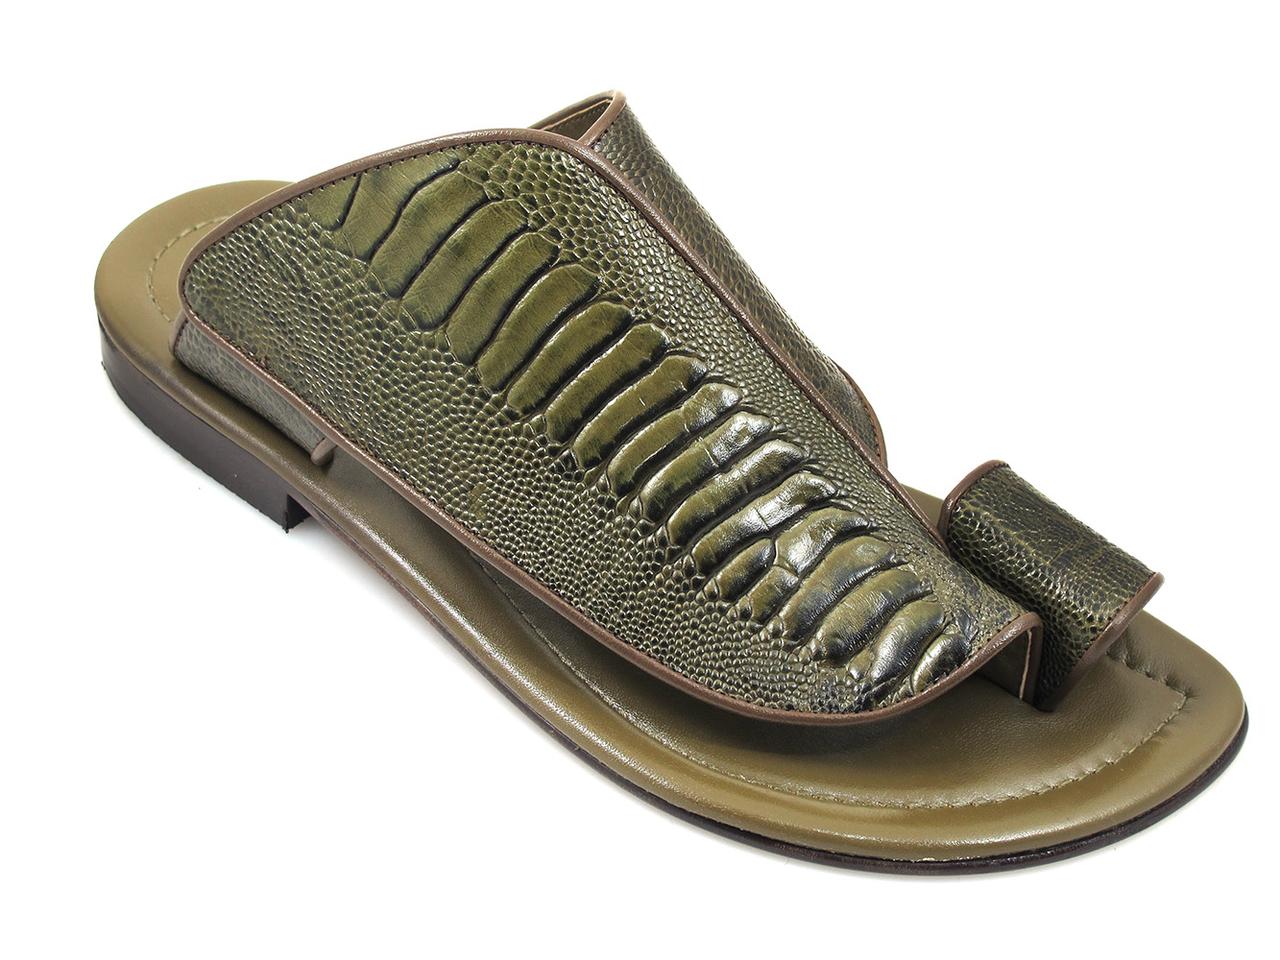 f019c5491 Davinci 2013 Ostrich Print Men s Italian Push In Toe Ring Sandal.  239.00.  2013 green